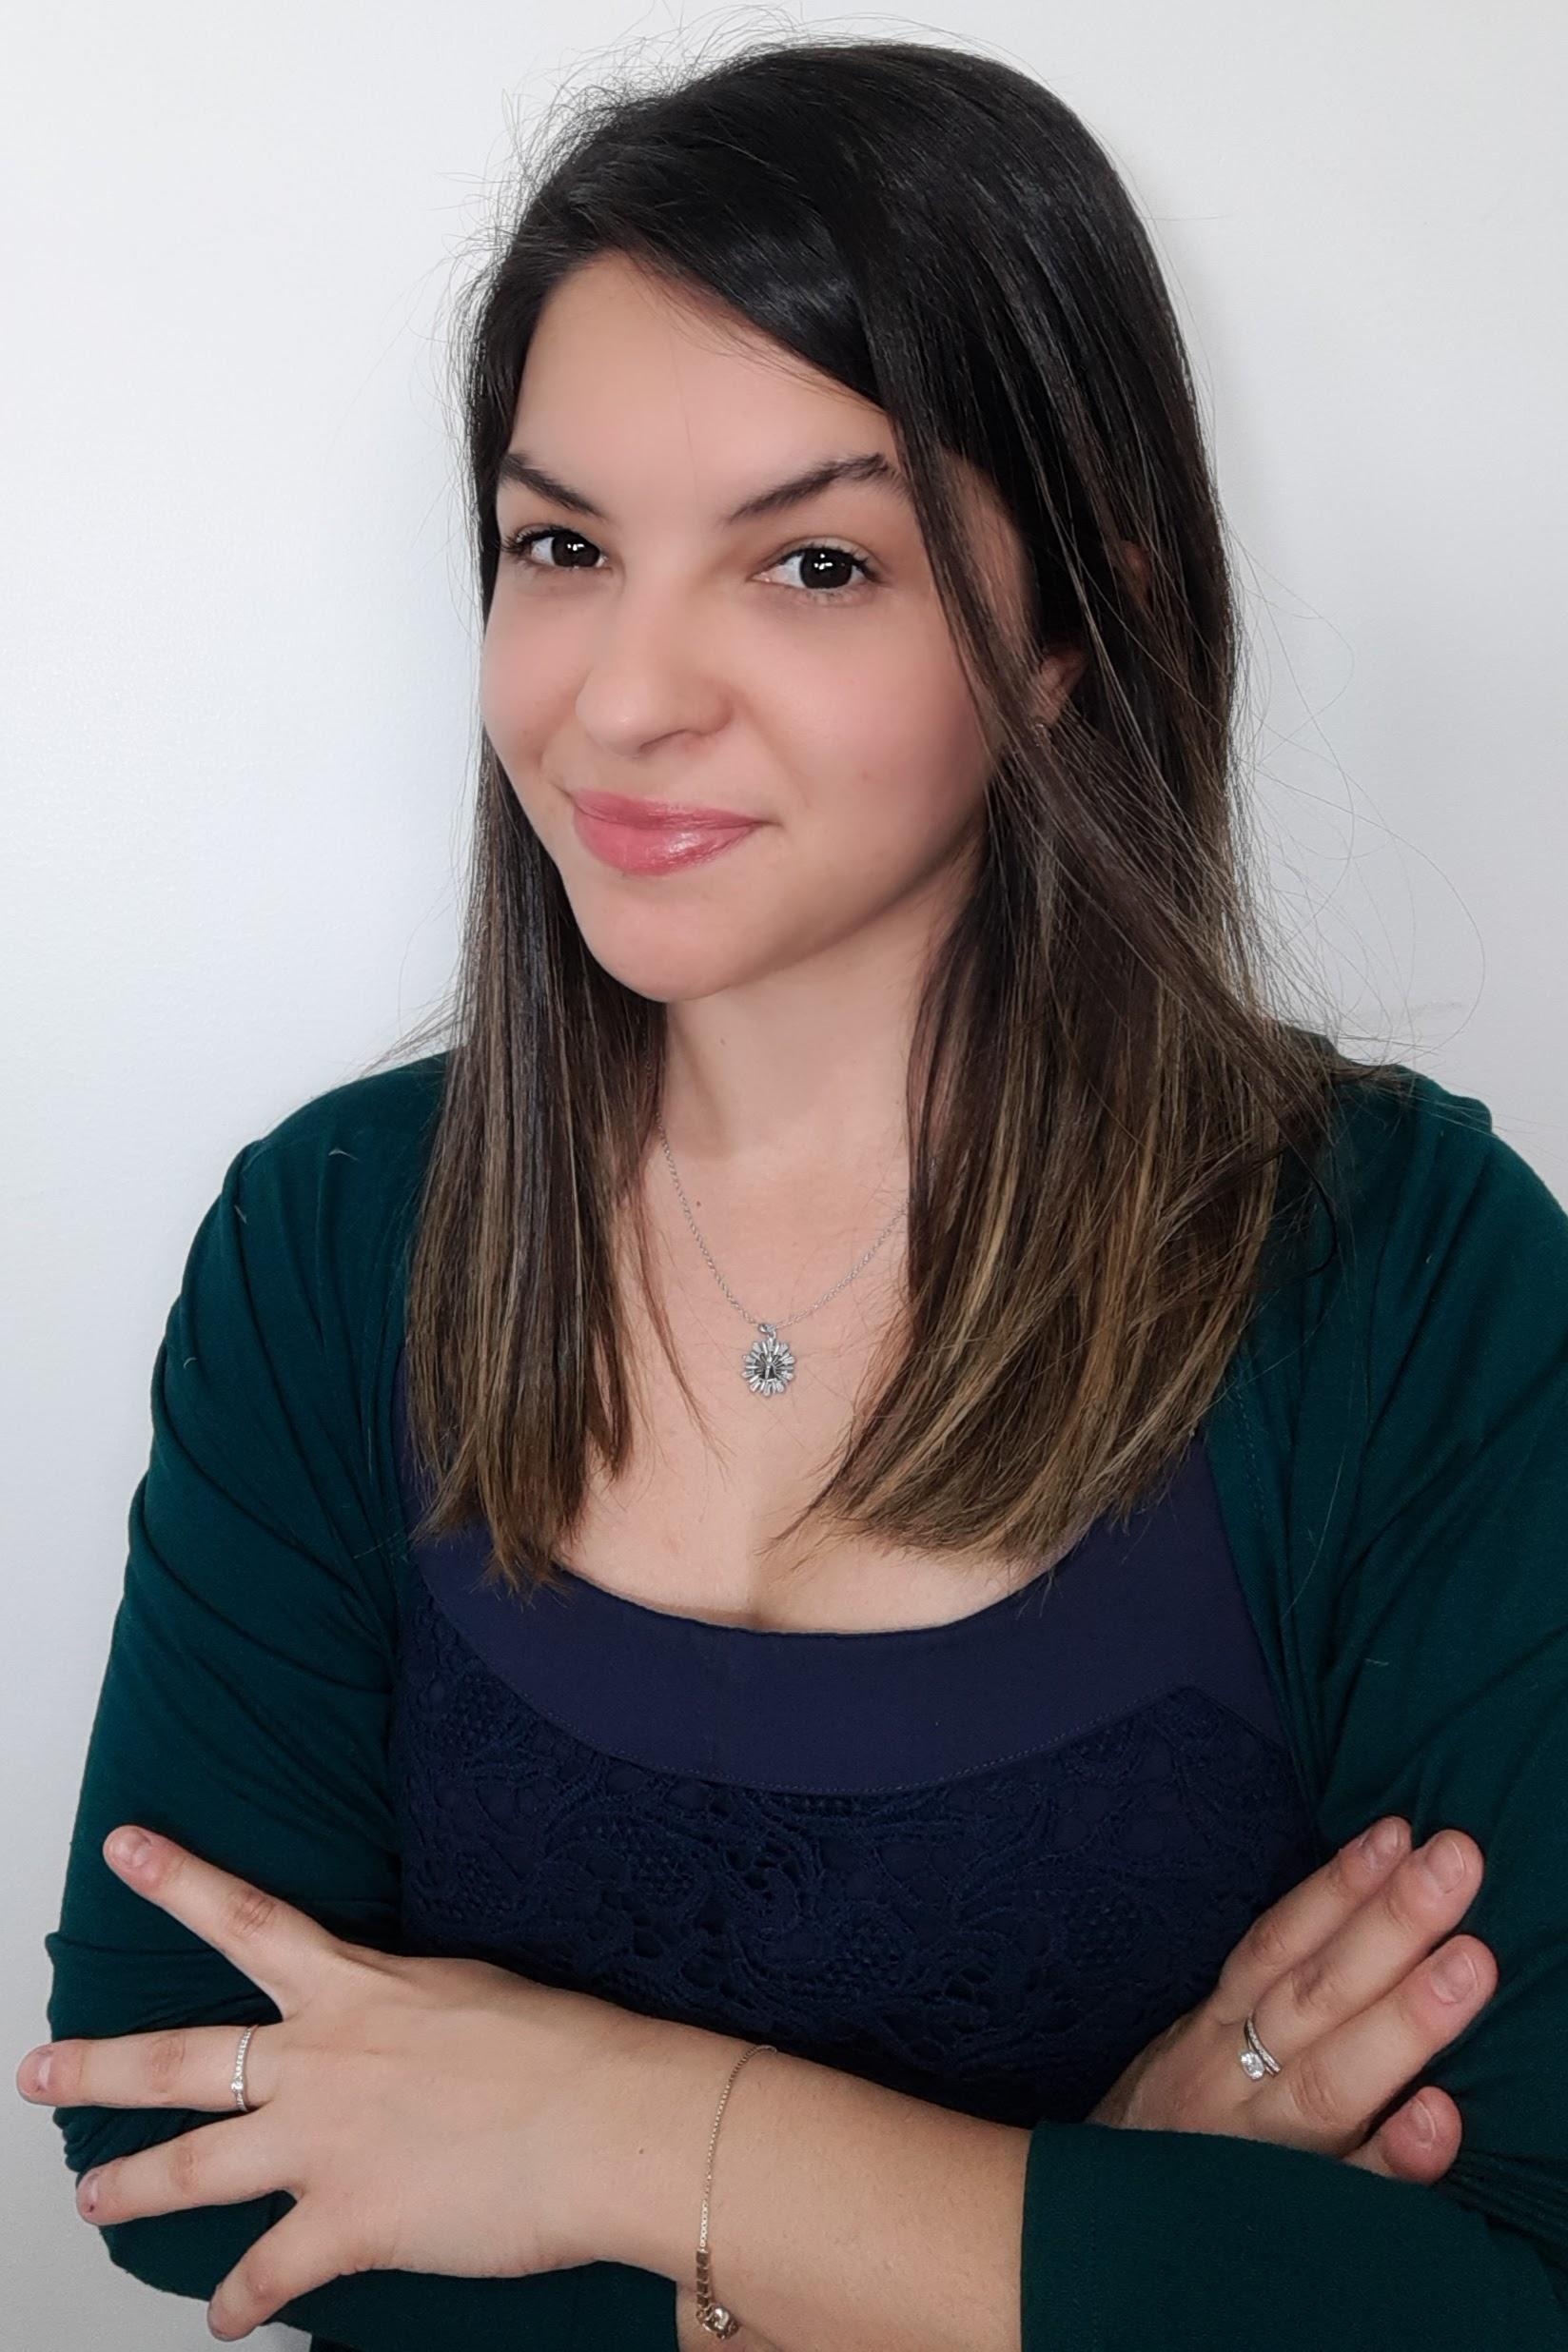 Roberta Teixeira Polez